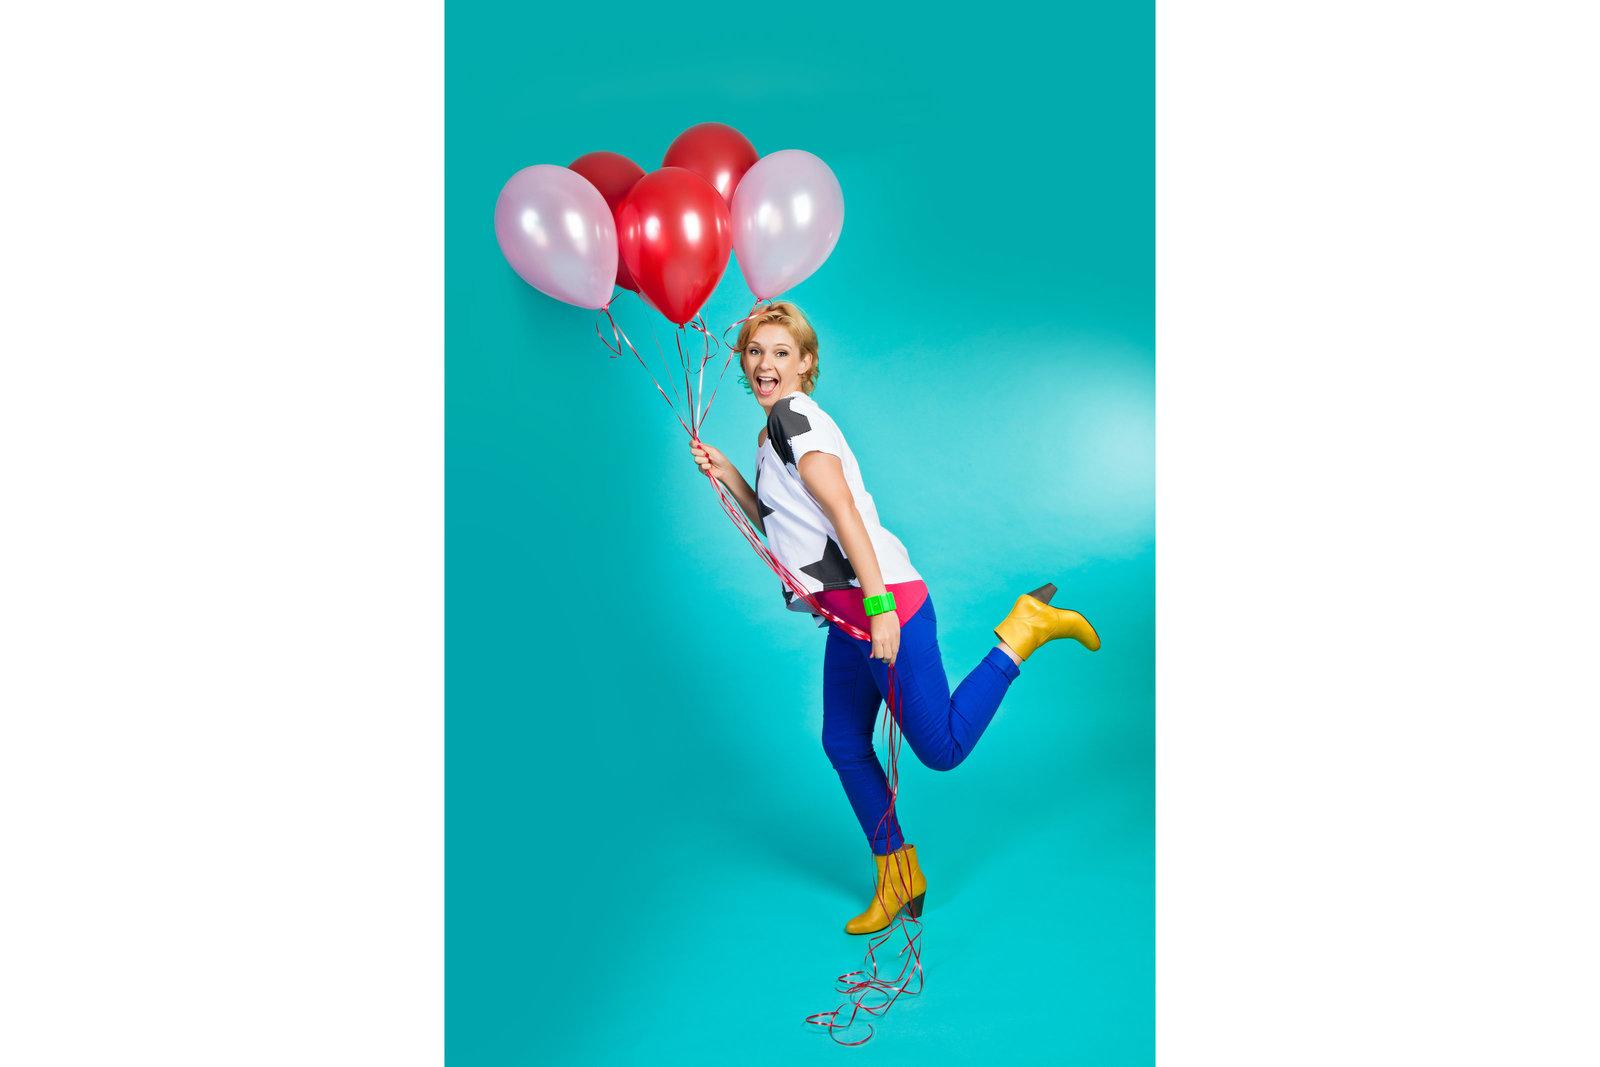 Vrolijk portret met felle kleuren en ballonnen. Copyright Nanda Zee-Fritse | FOTOZEE